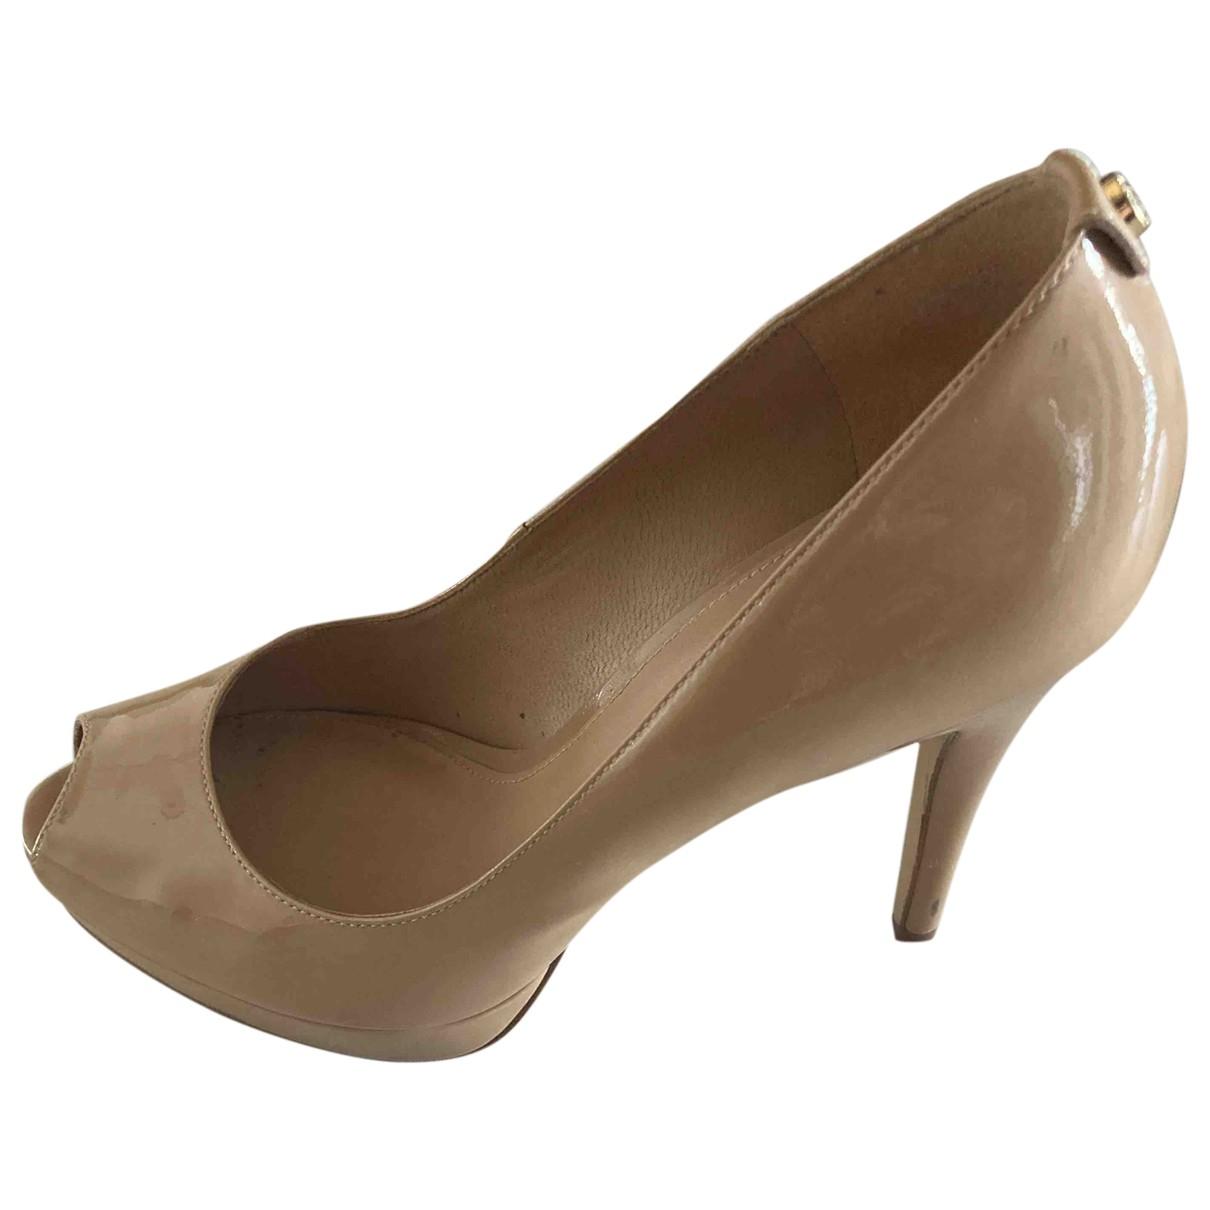 Michael Kors \N Beige Patent leather Heels for Women 8.5 US